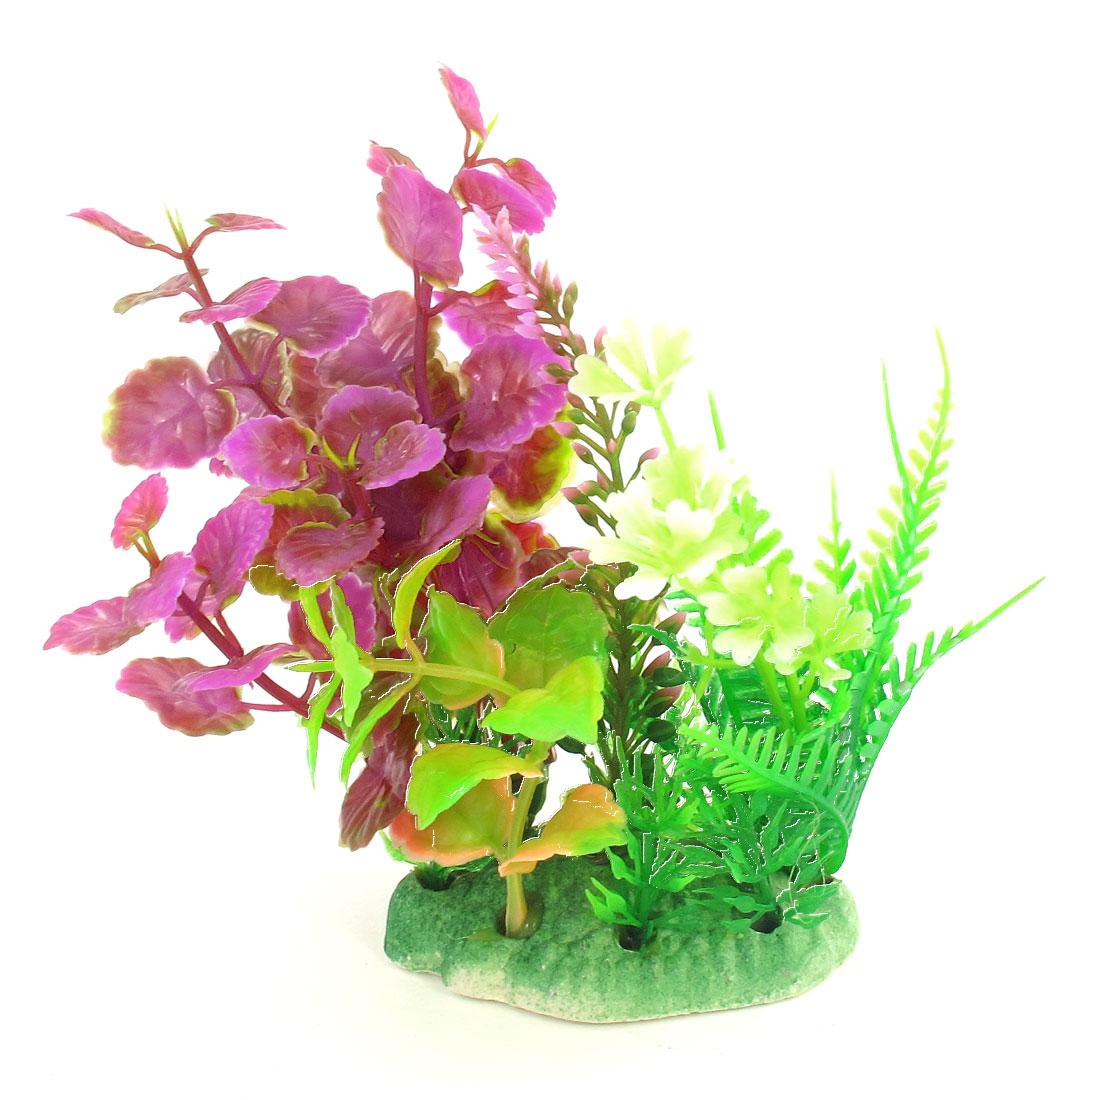 "Emulational Aquarium Plant Adorn Green Magenta 5.1"" Height for Fishbowl"